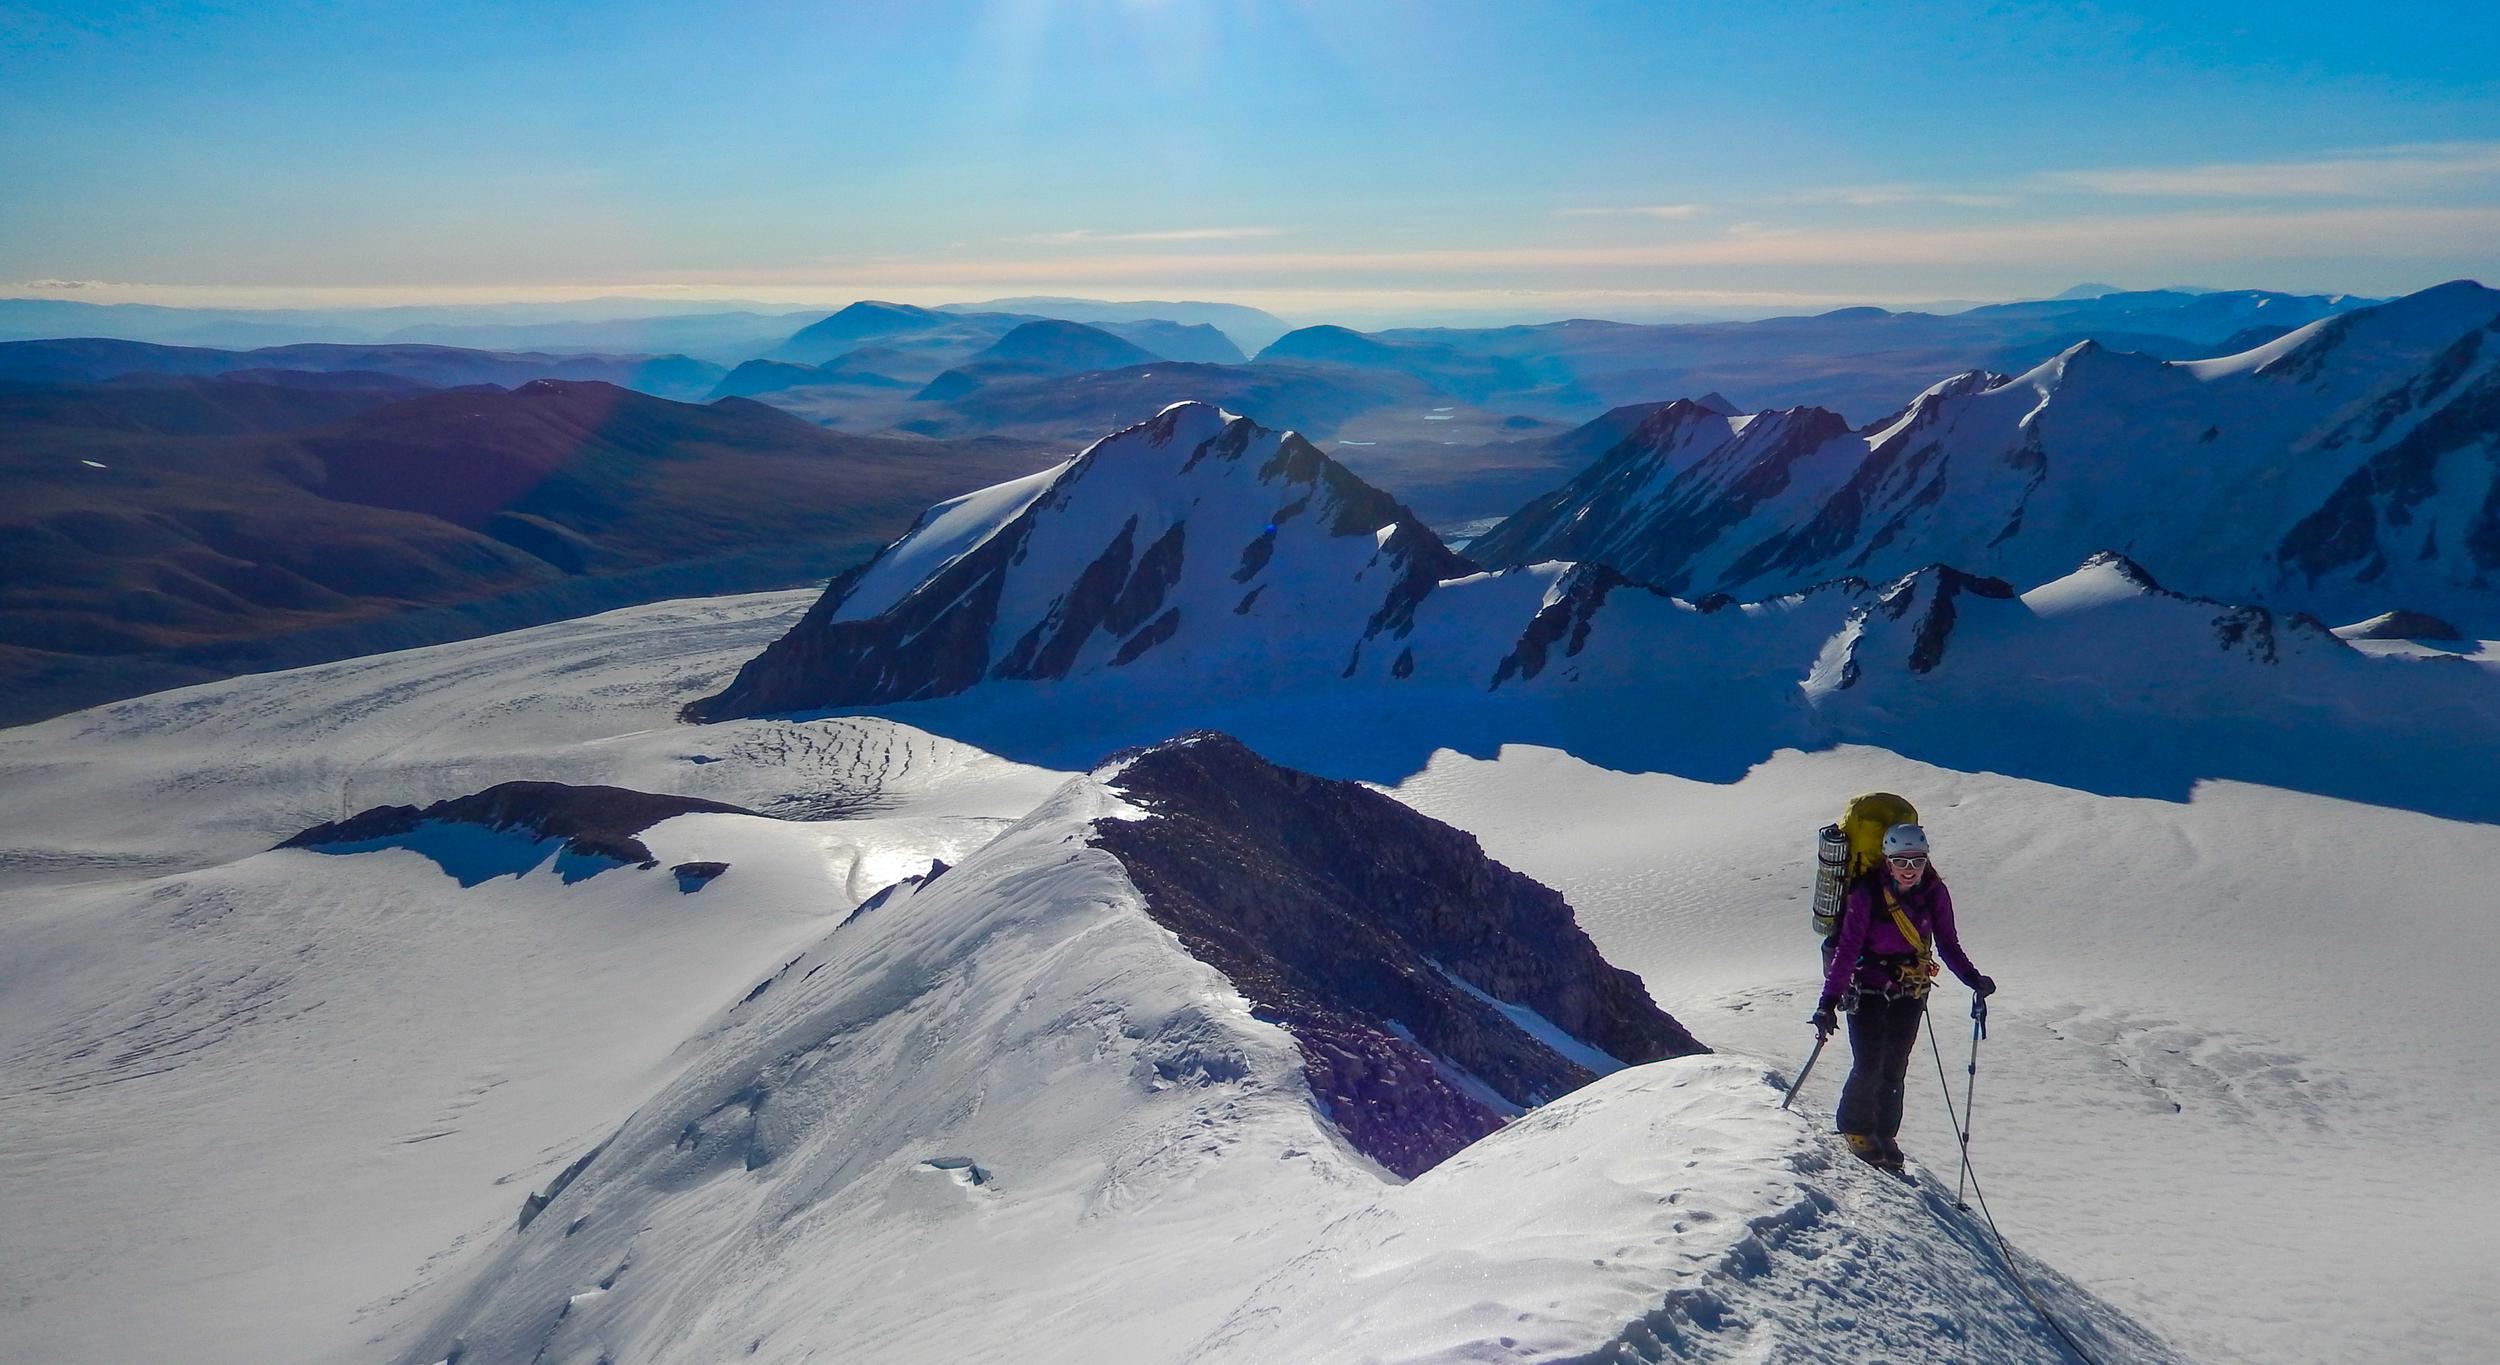 Ascending Mount Khuiten